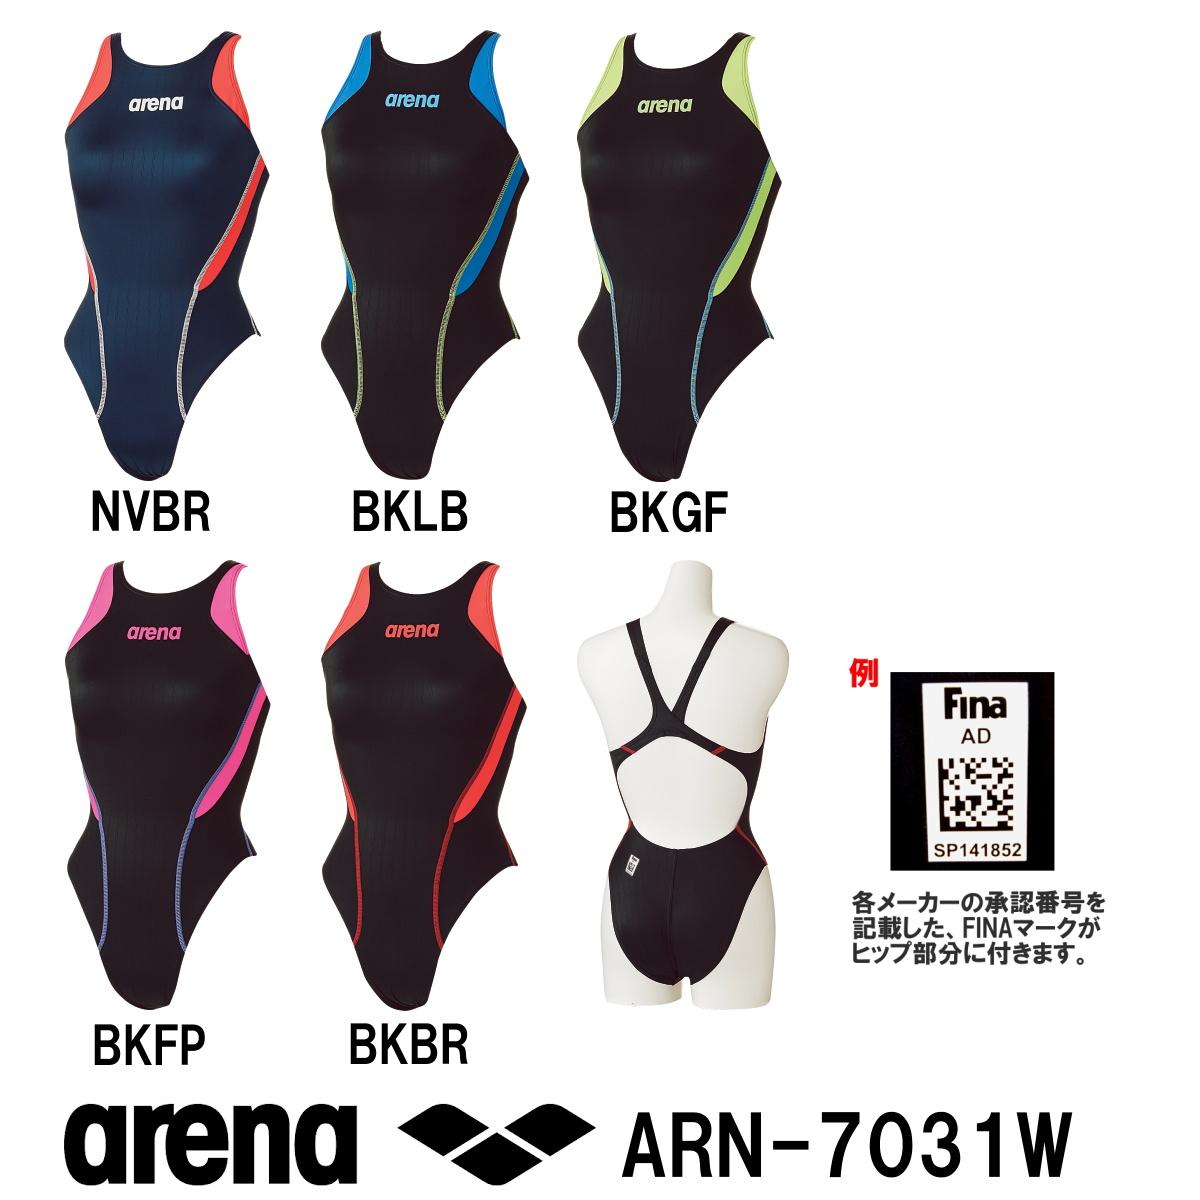 872b8de9005 《今すぐ使えるクーポン配布中》アリーナ ARENA 競泳水着 レディース リミック クロスバック fina承認 X-PYTHON2  ARN-7031W-HK